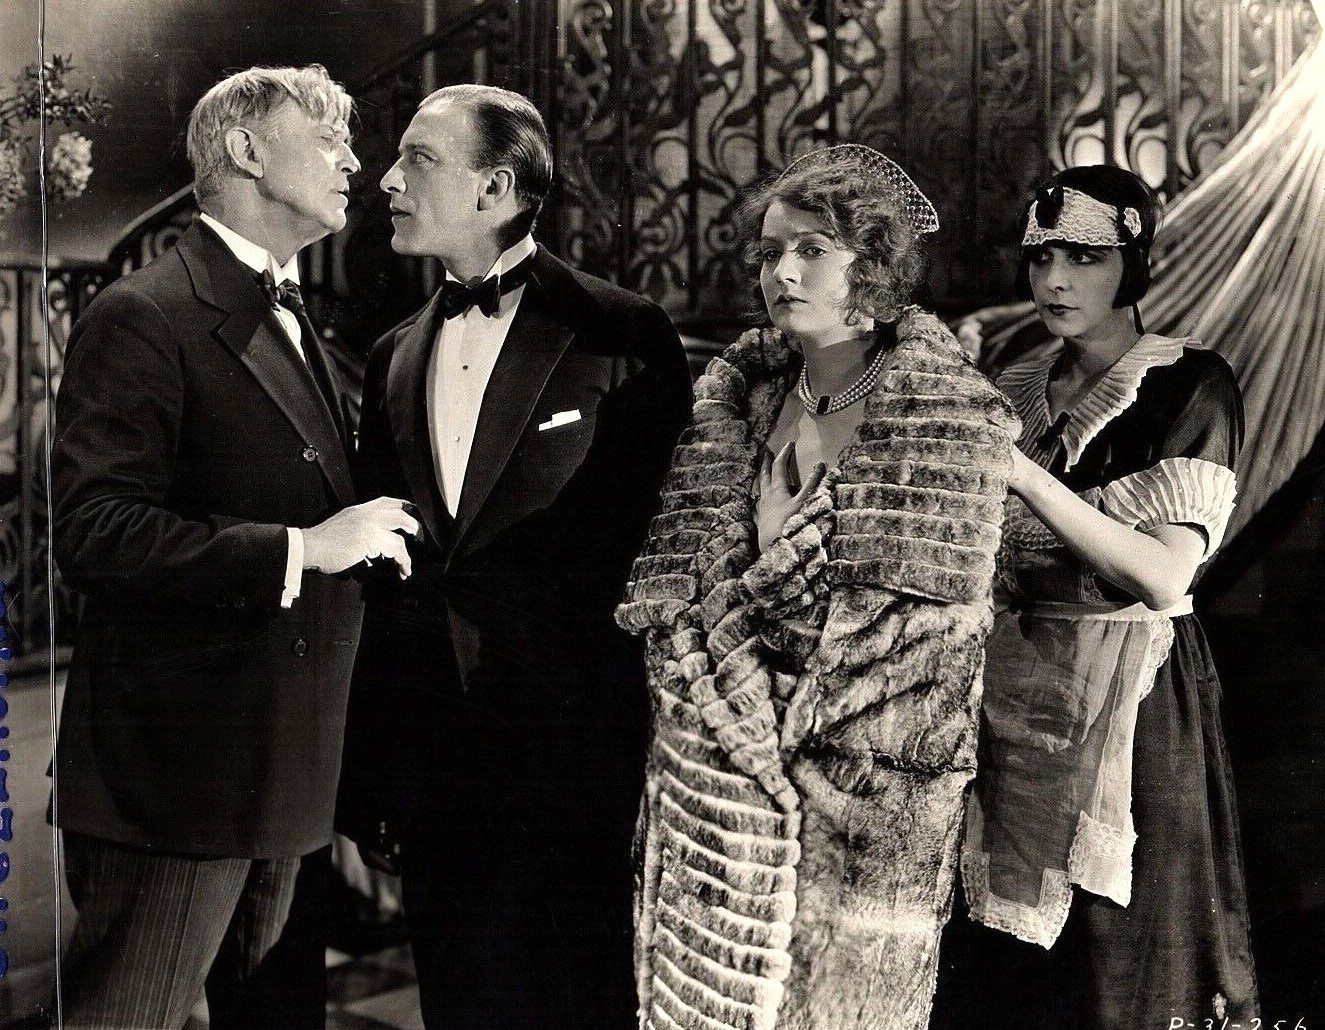 Lloyd Hughes, Doris Kenyon, and Frank Mayo in If I Marry Again (1925)